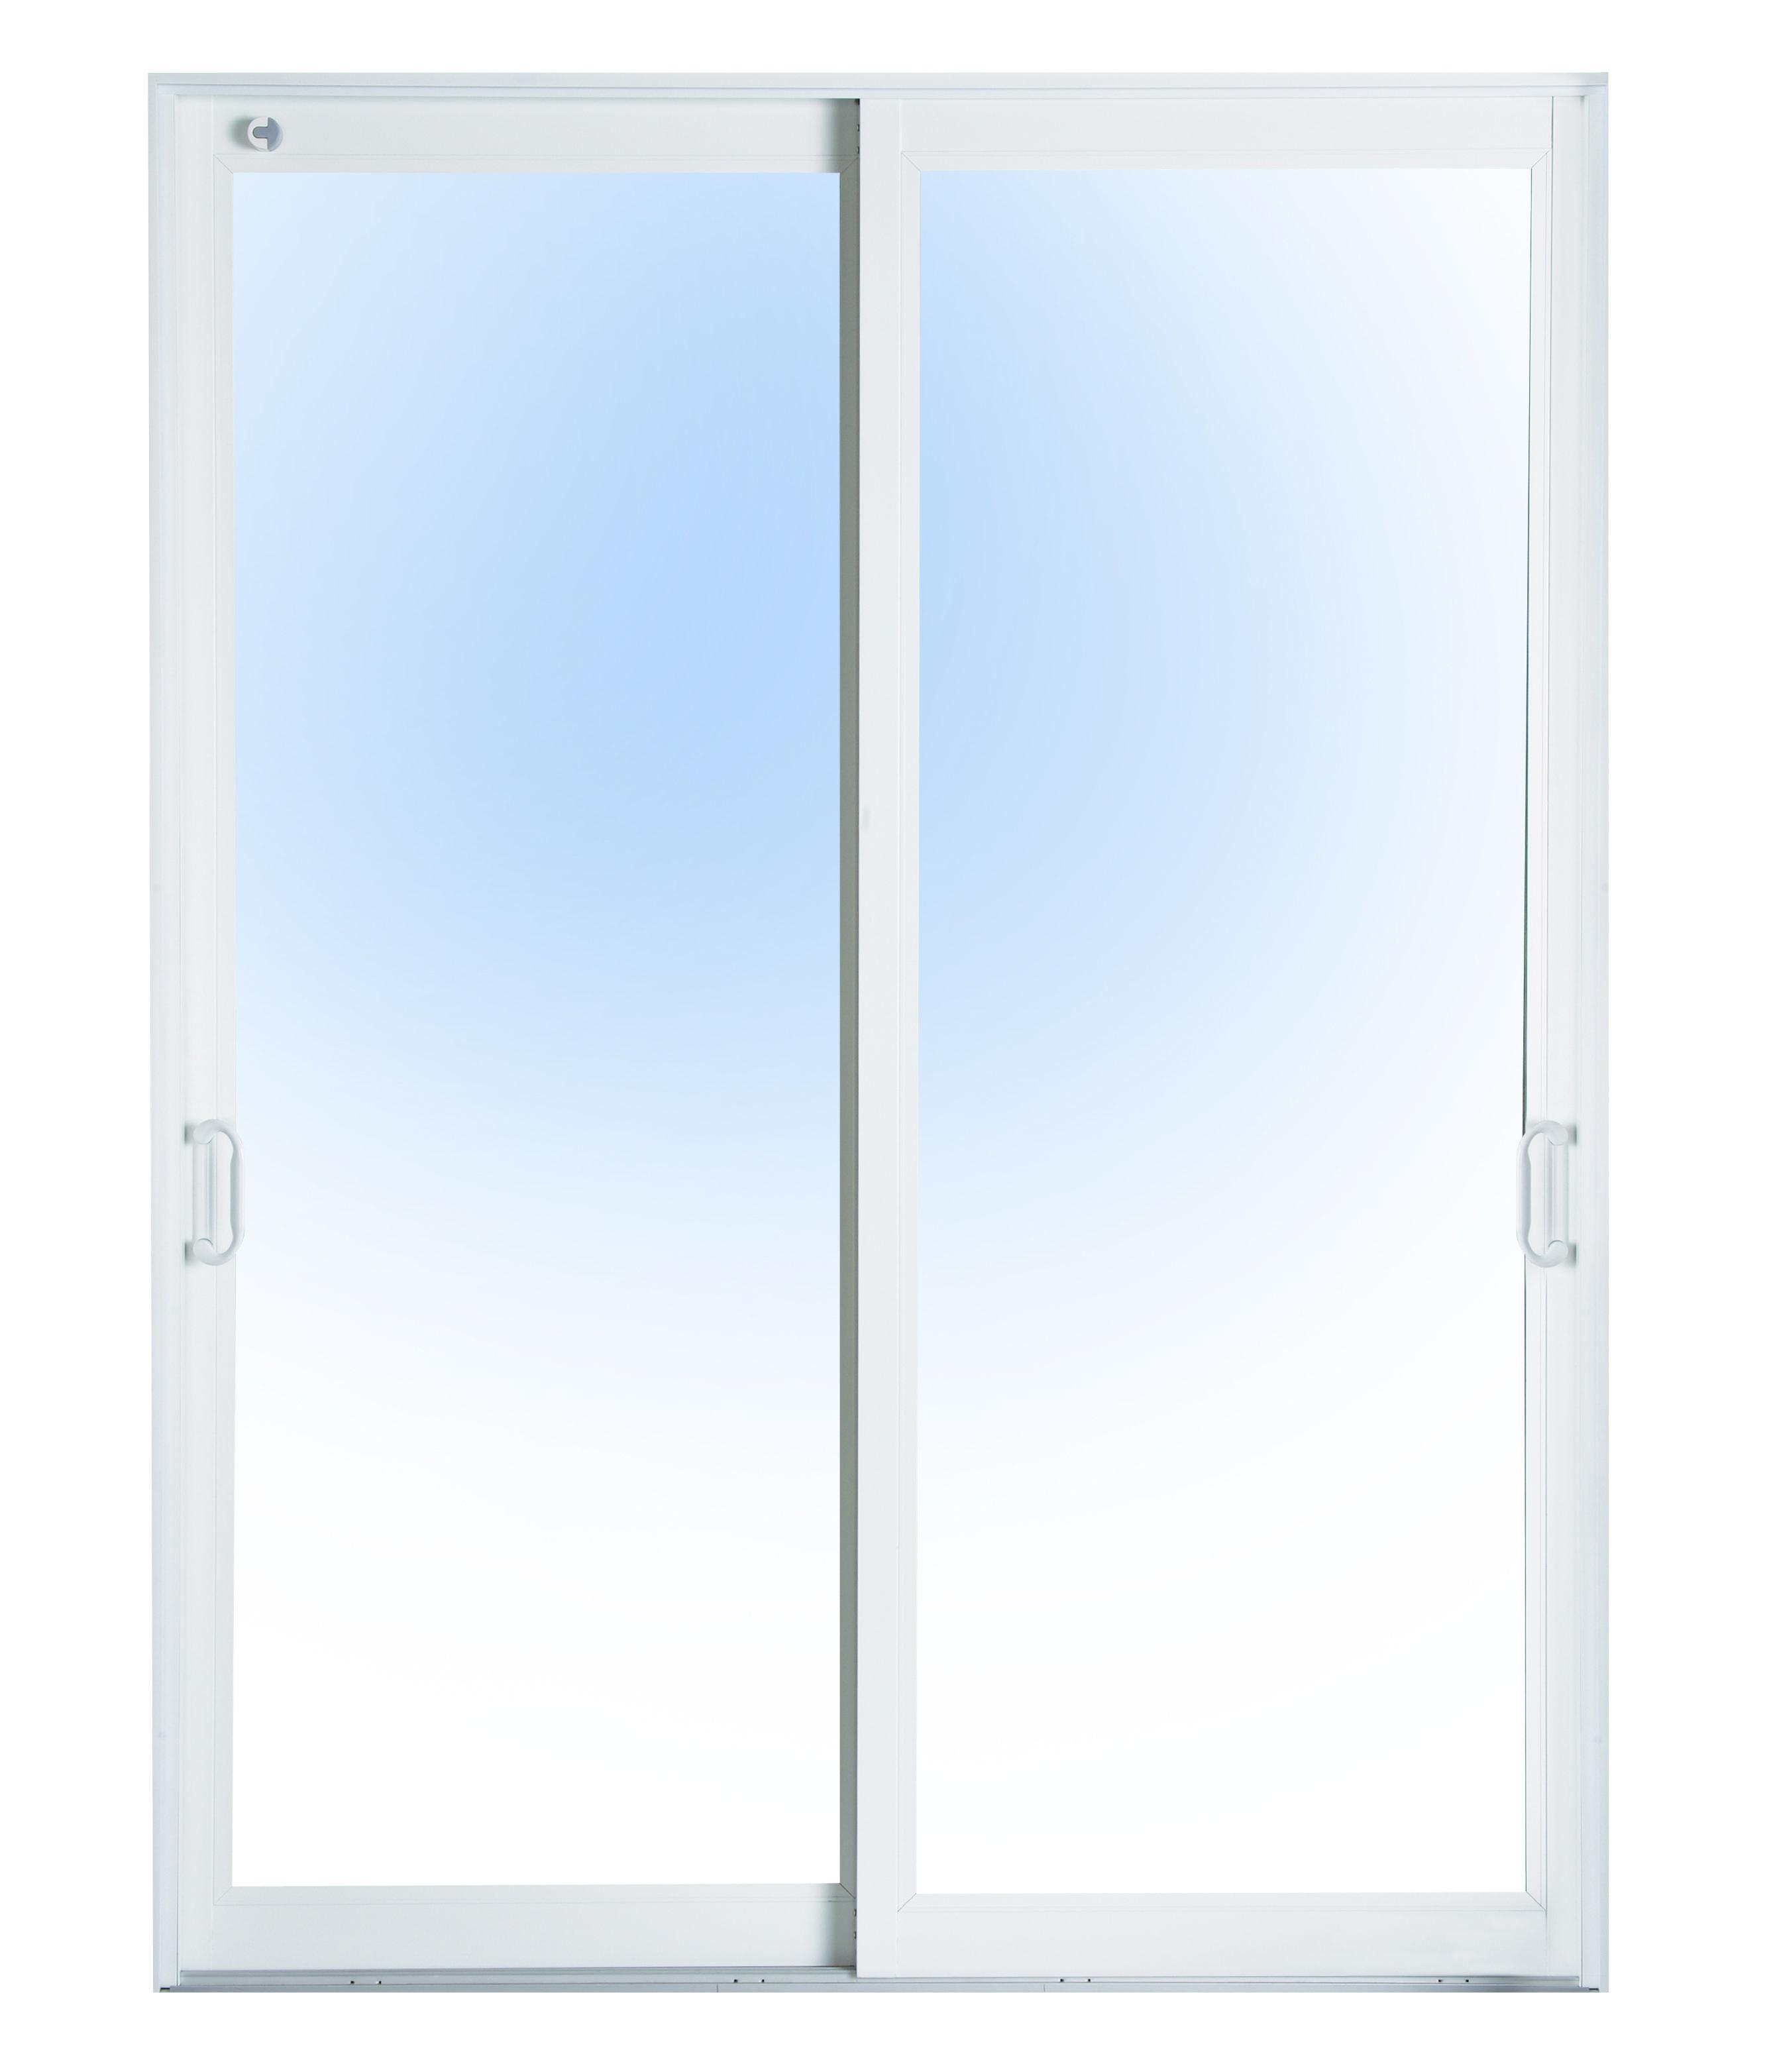 Sentinel Sliding Glass Doors Series 150 Impact Windows Windows And Doors Sliding Glass Door